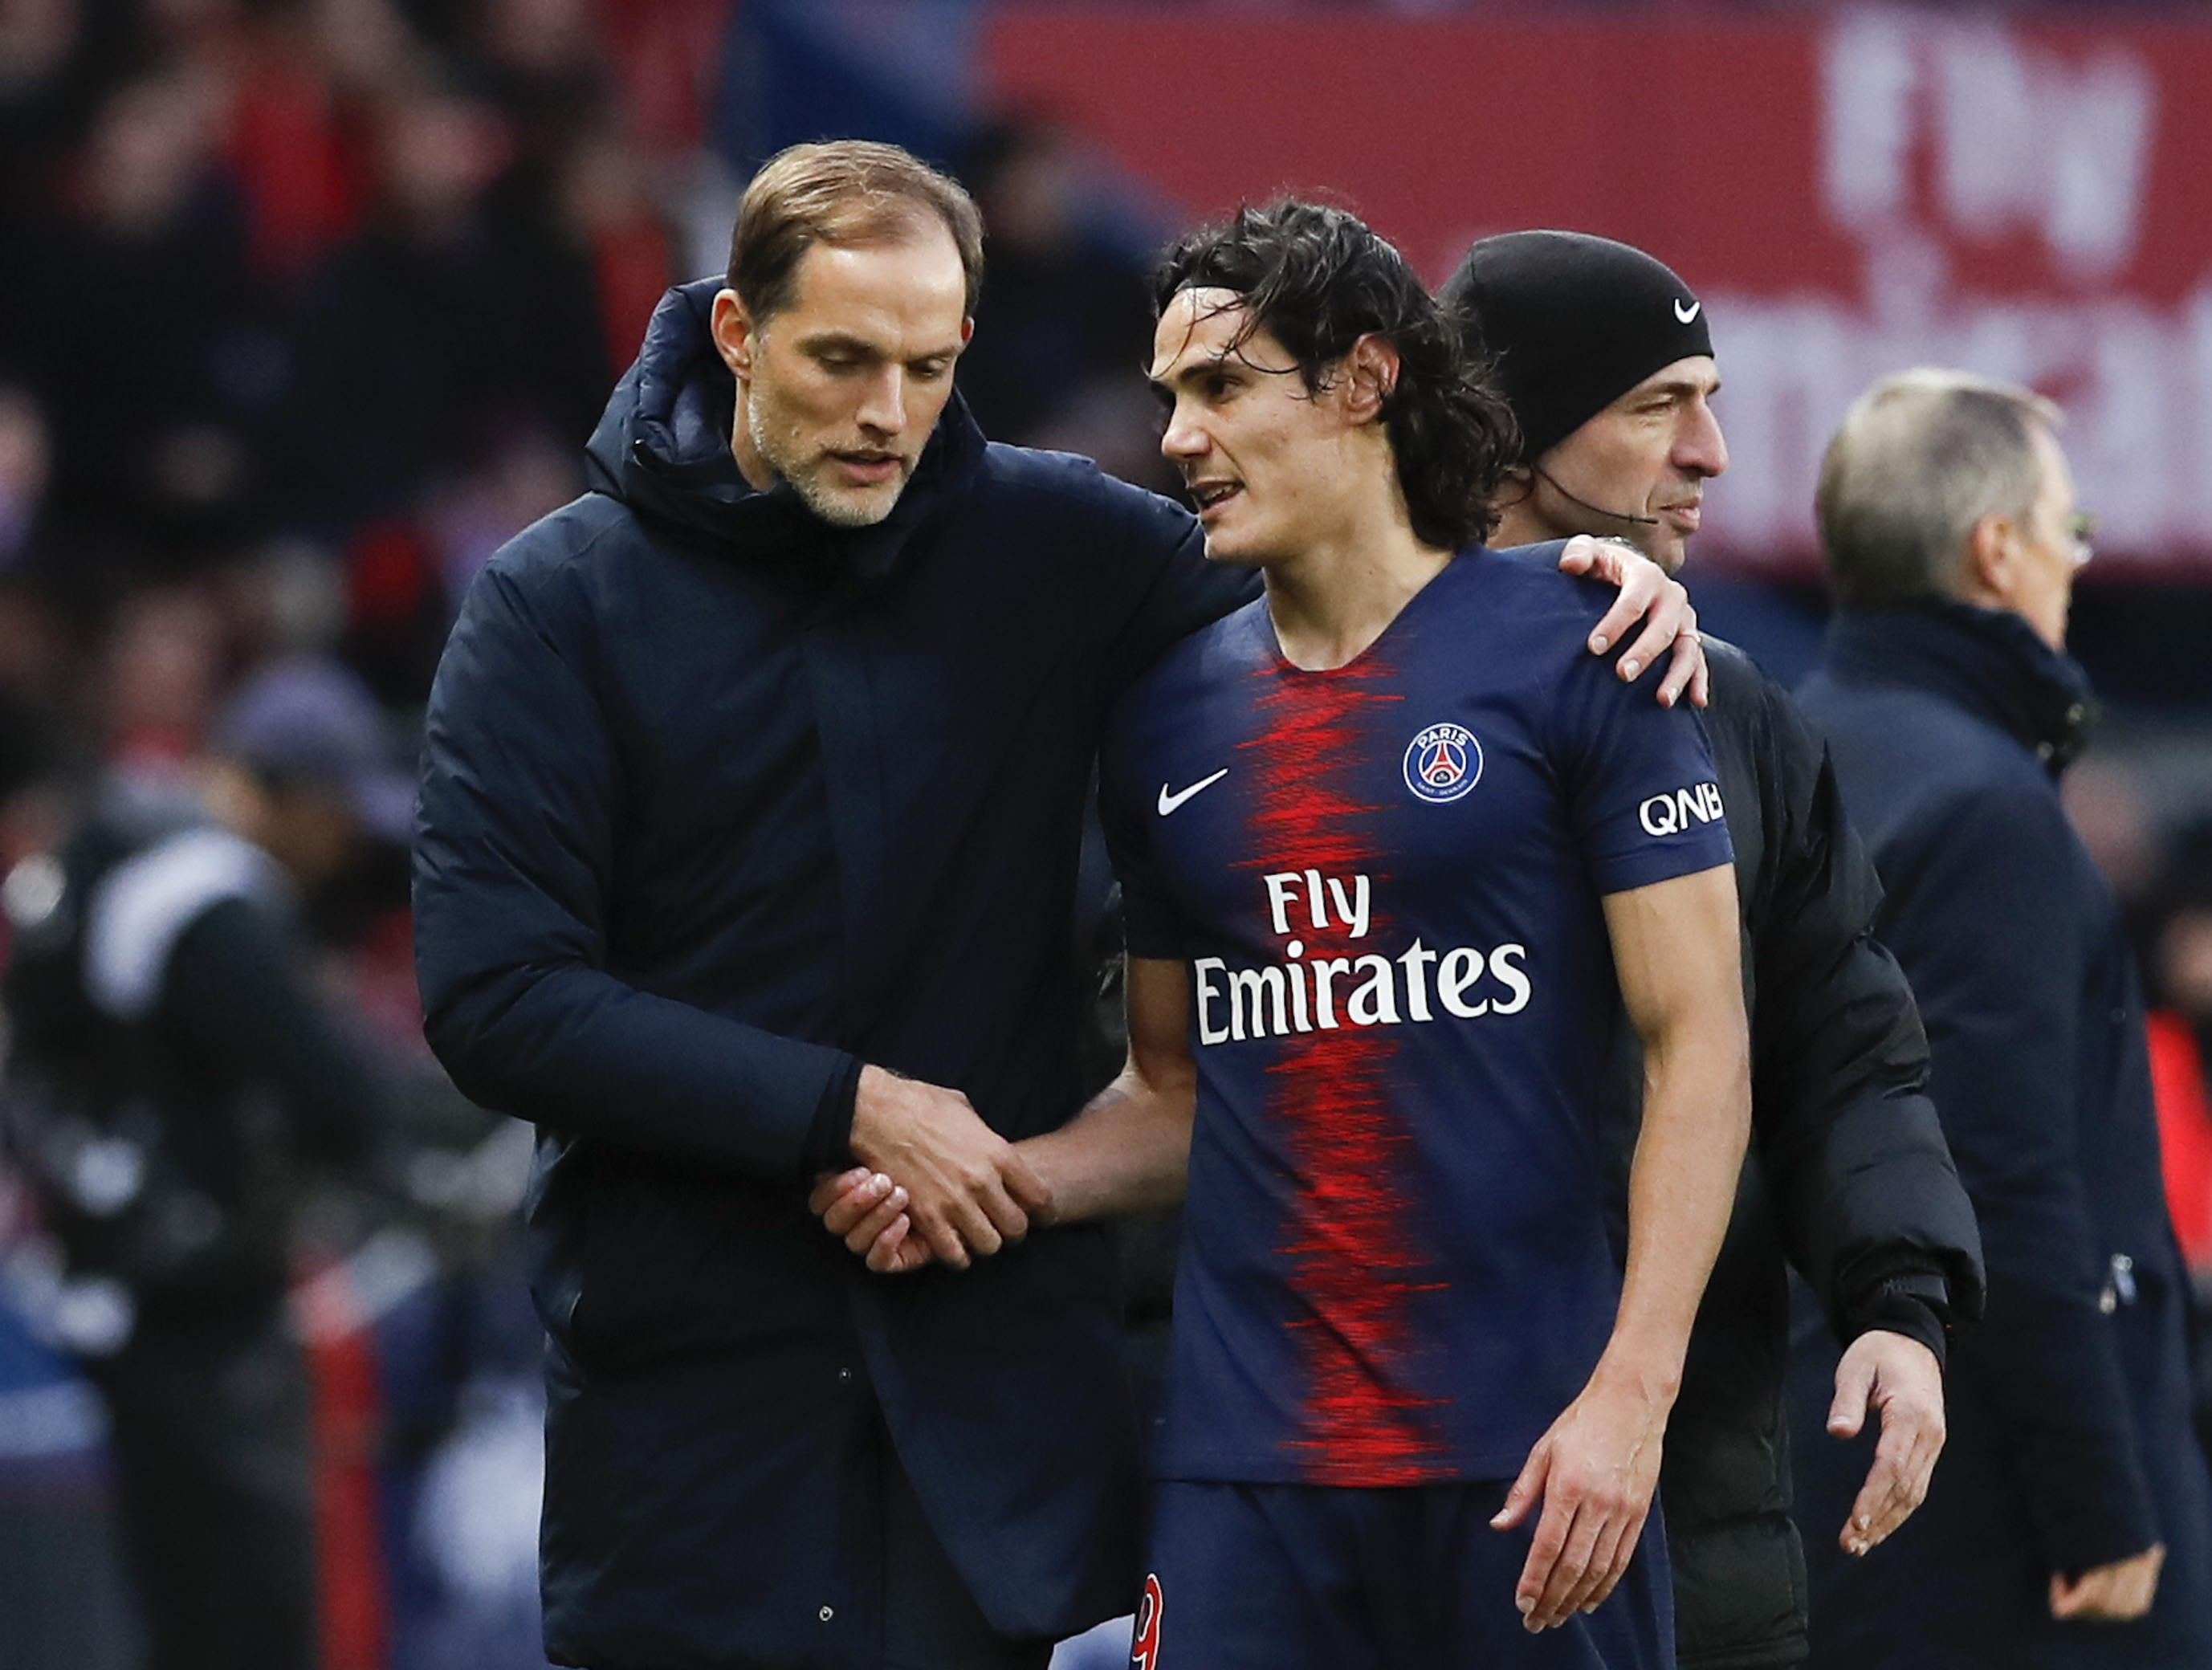 PSG striker Edinson Cavani limps off injured in home win